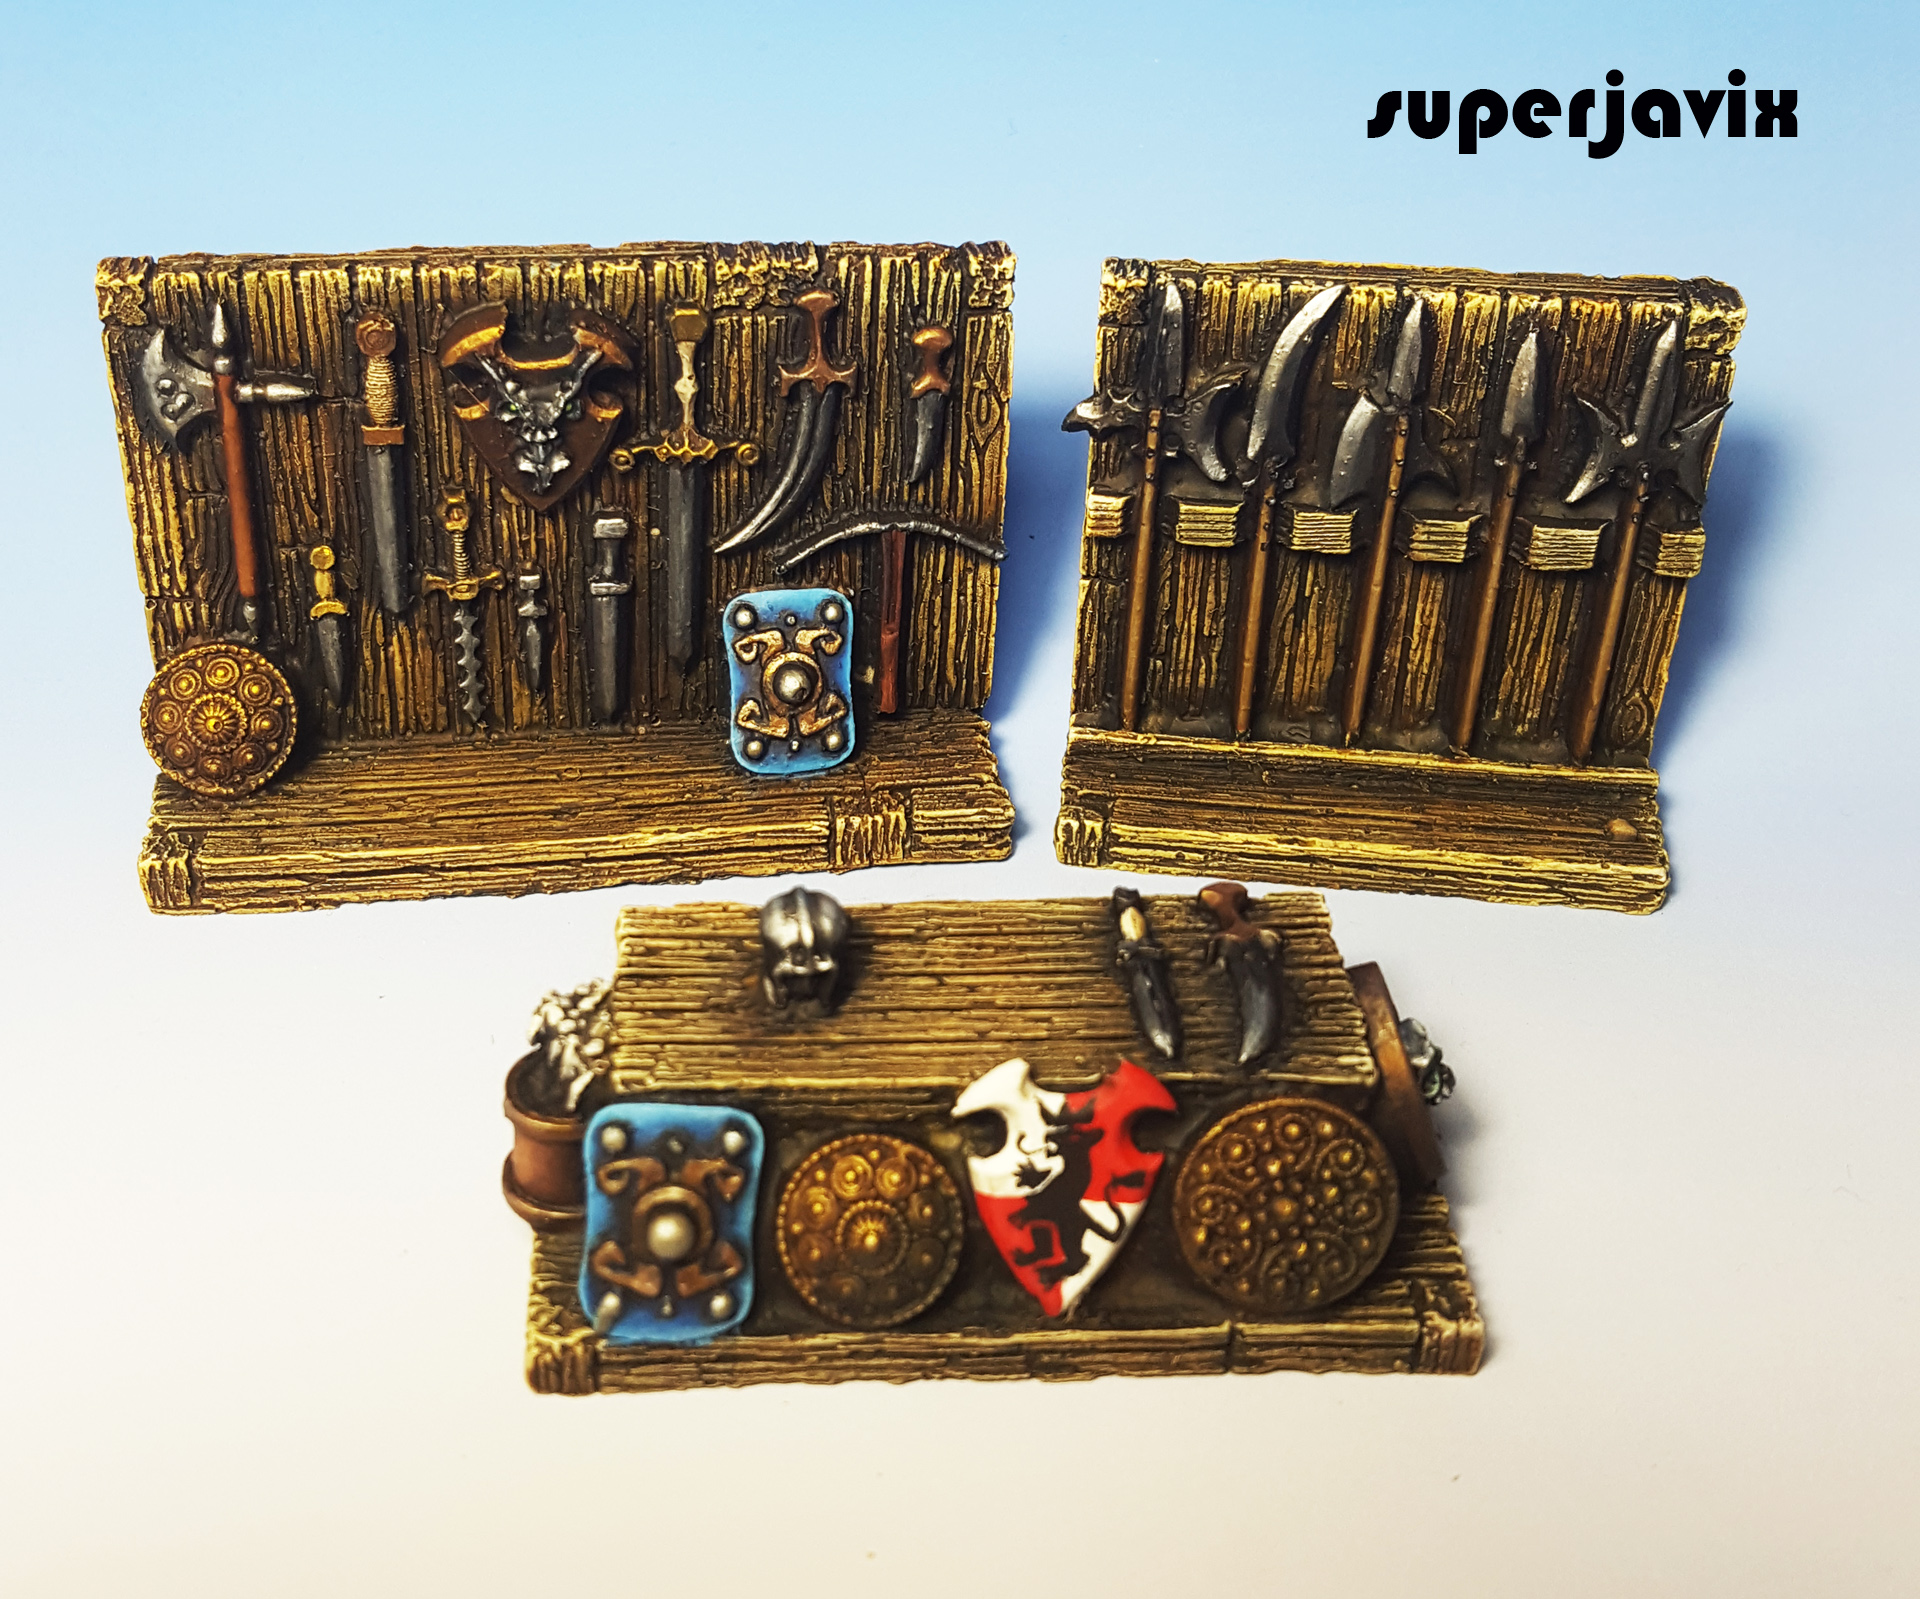 Scotia Grendel Armory